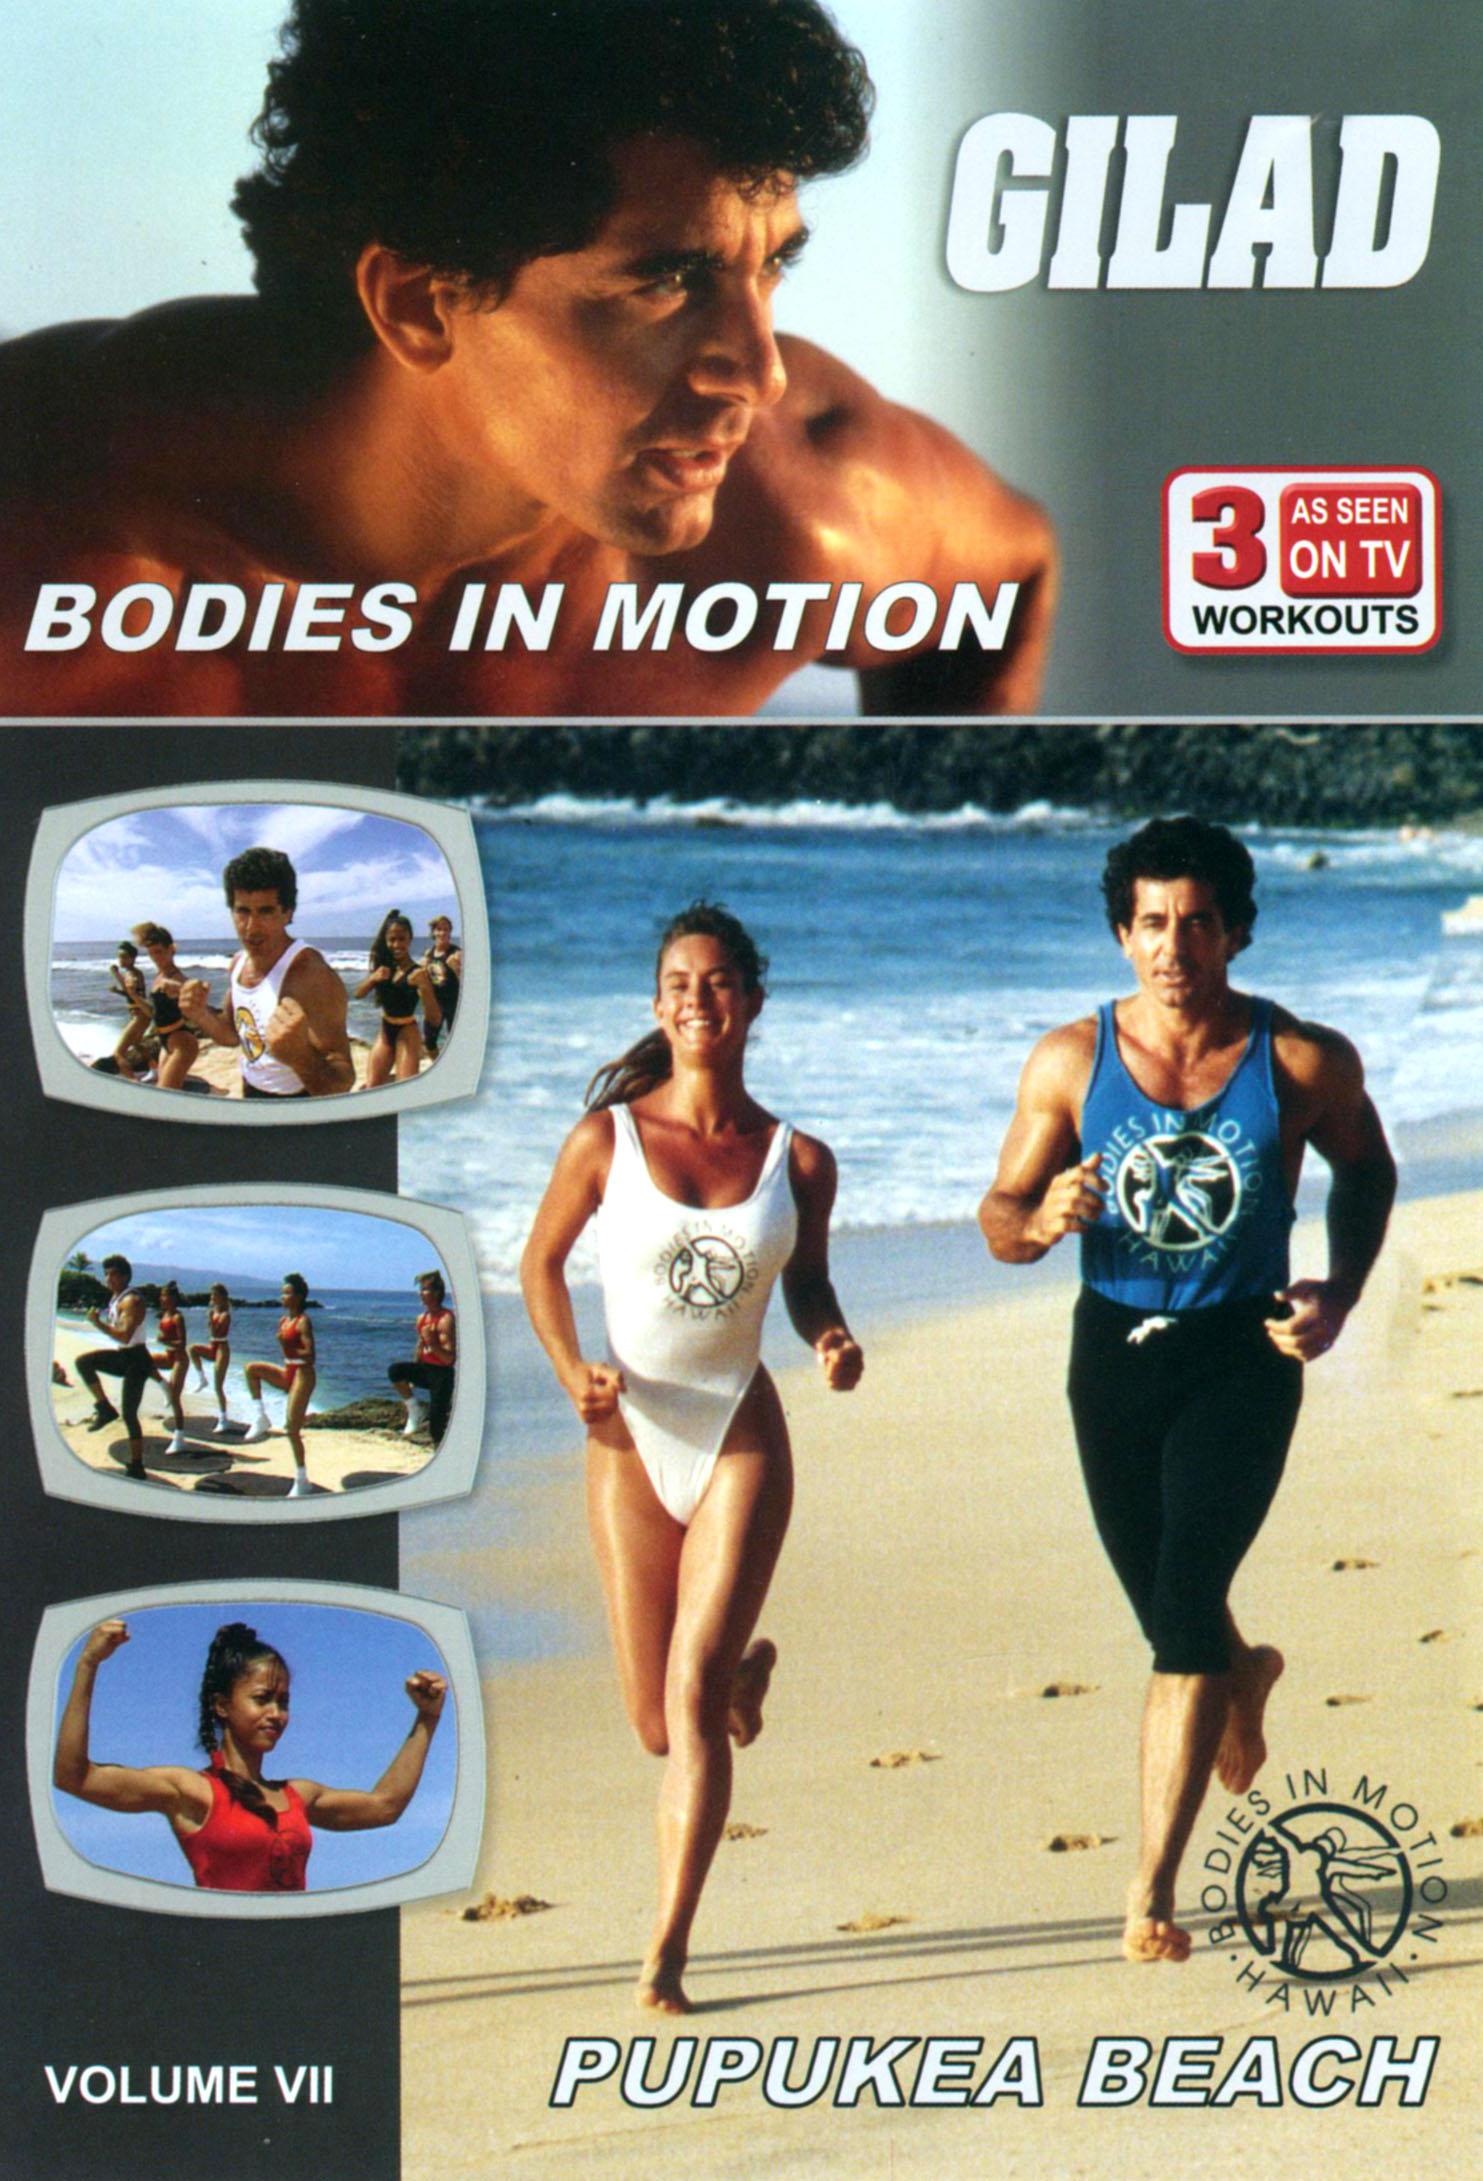 Gilad: Bodies in Motion, Vol. 7 - Pupukea Beach